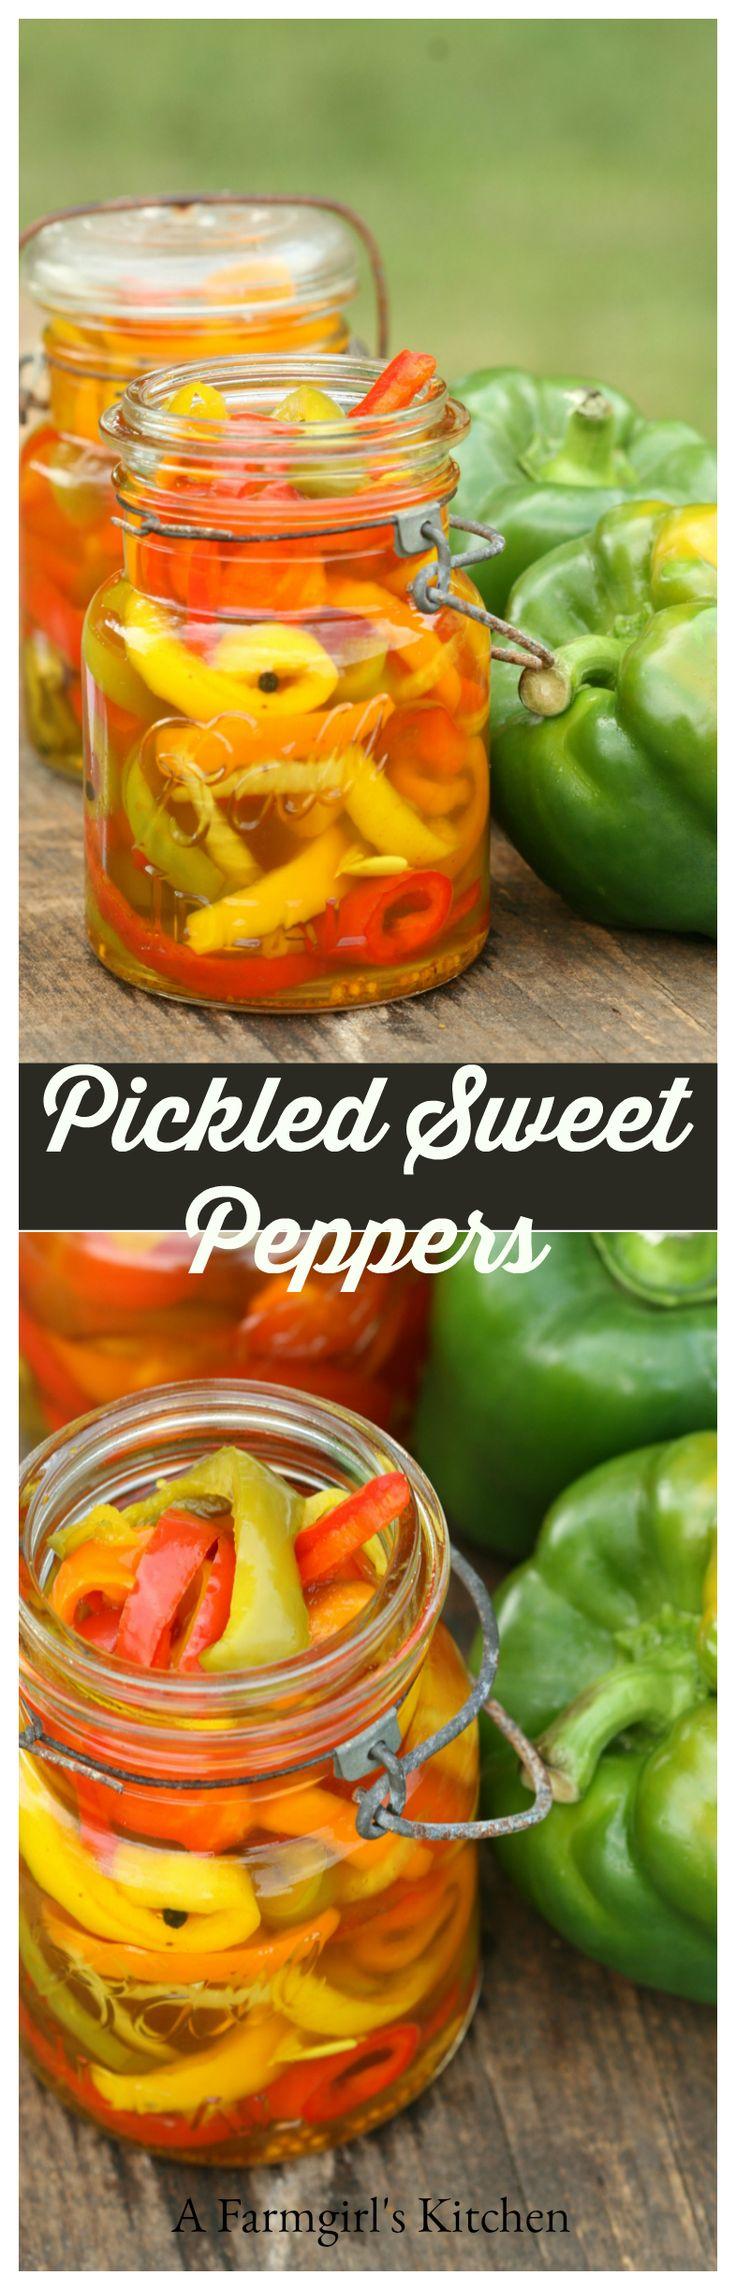 Homemade Pickled Sweet Peppers #recipe #homemade https://afarmgirlskitchen.com/pickled-sweet-peppers/